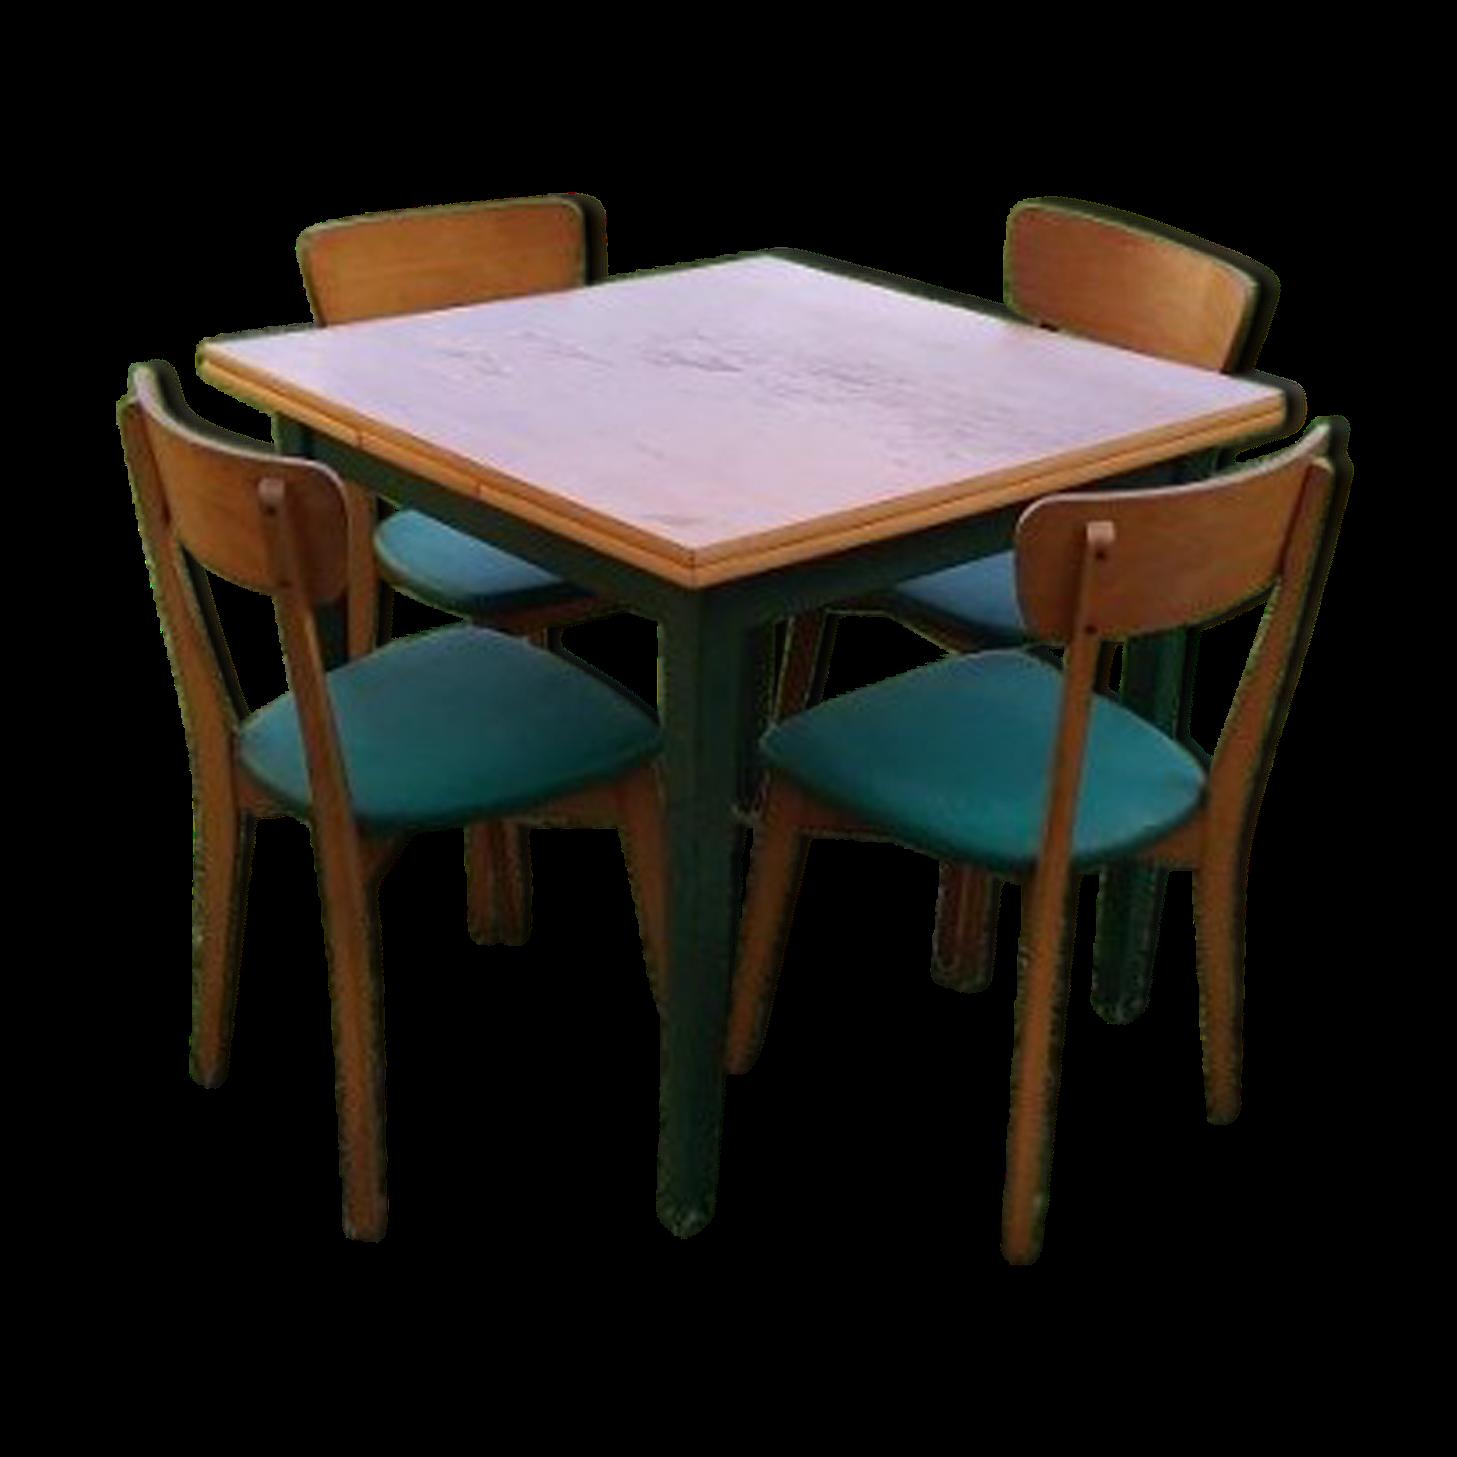 Table bois carre avec rallonge simple good table carre en for Ensemble salle a manger table carree